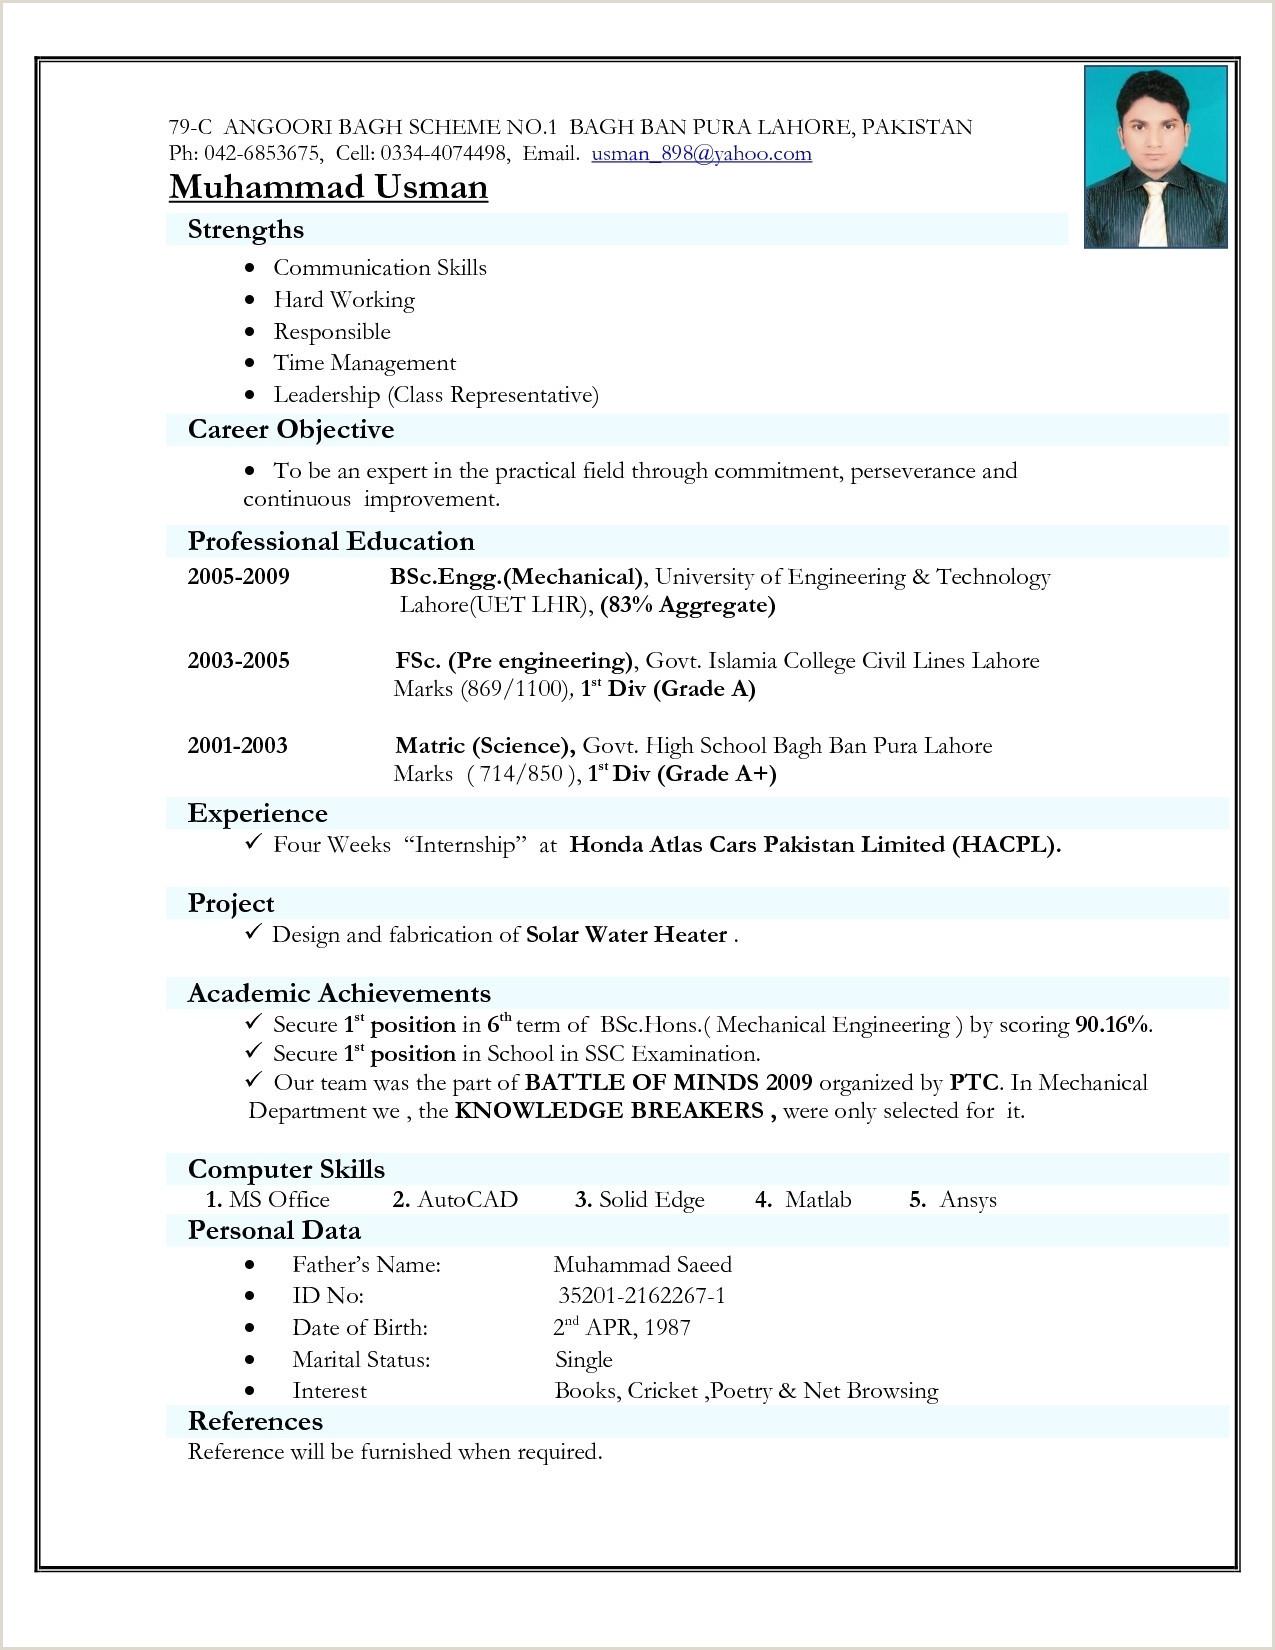 Mba Fresher Resume format Doc Hairstyles Mba Resume Sample Harvard Winning Marketing